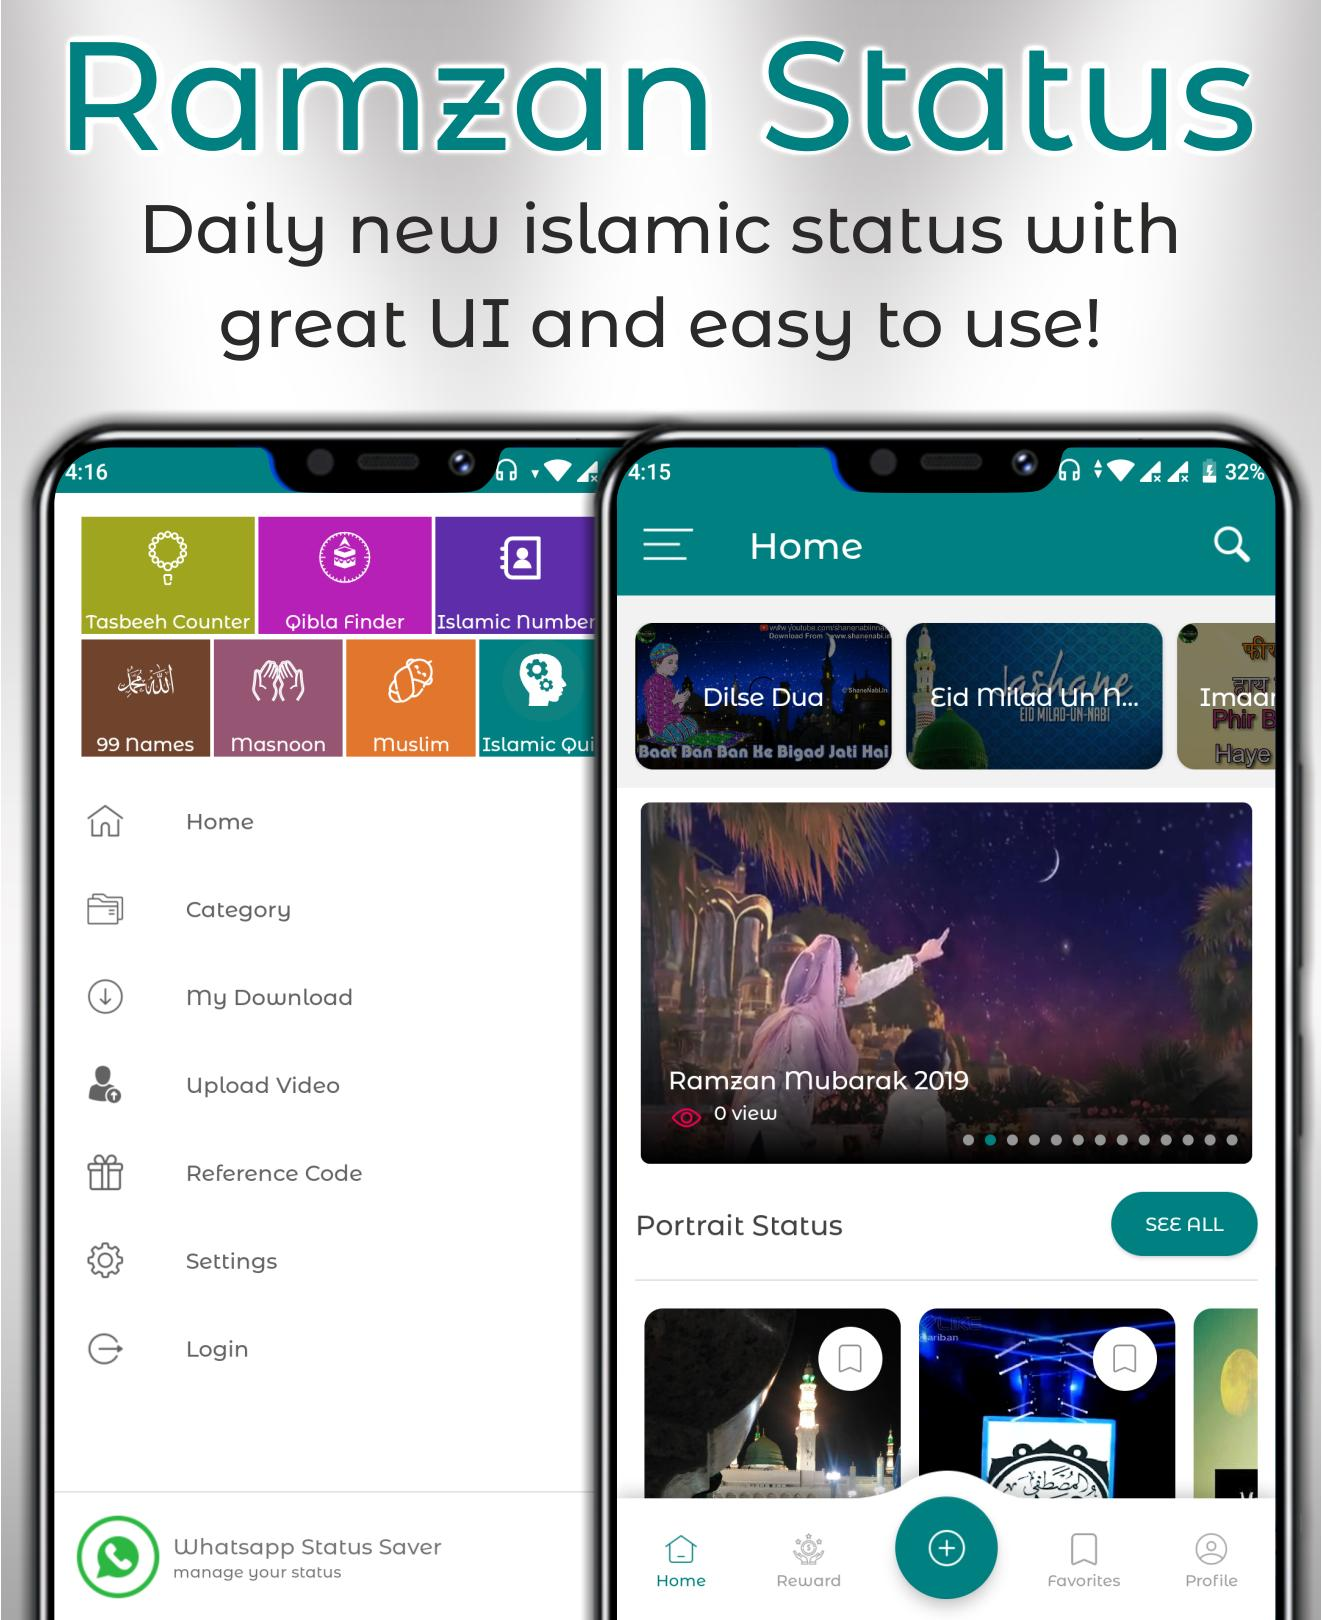 Eid Mubarak Status Video 2019 Islamic Status Video for